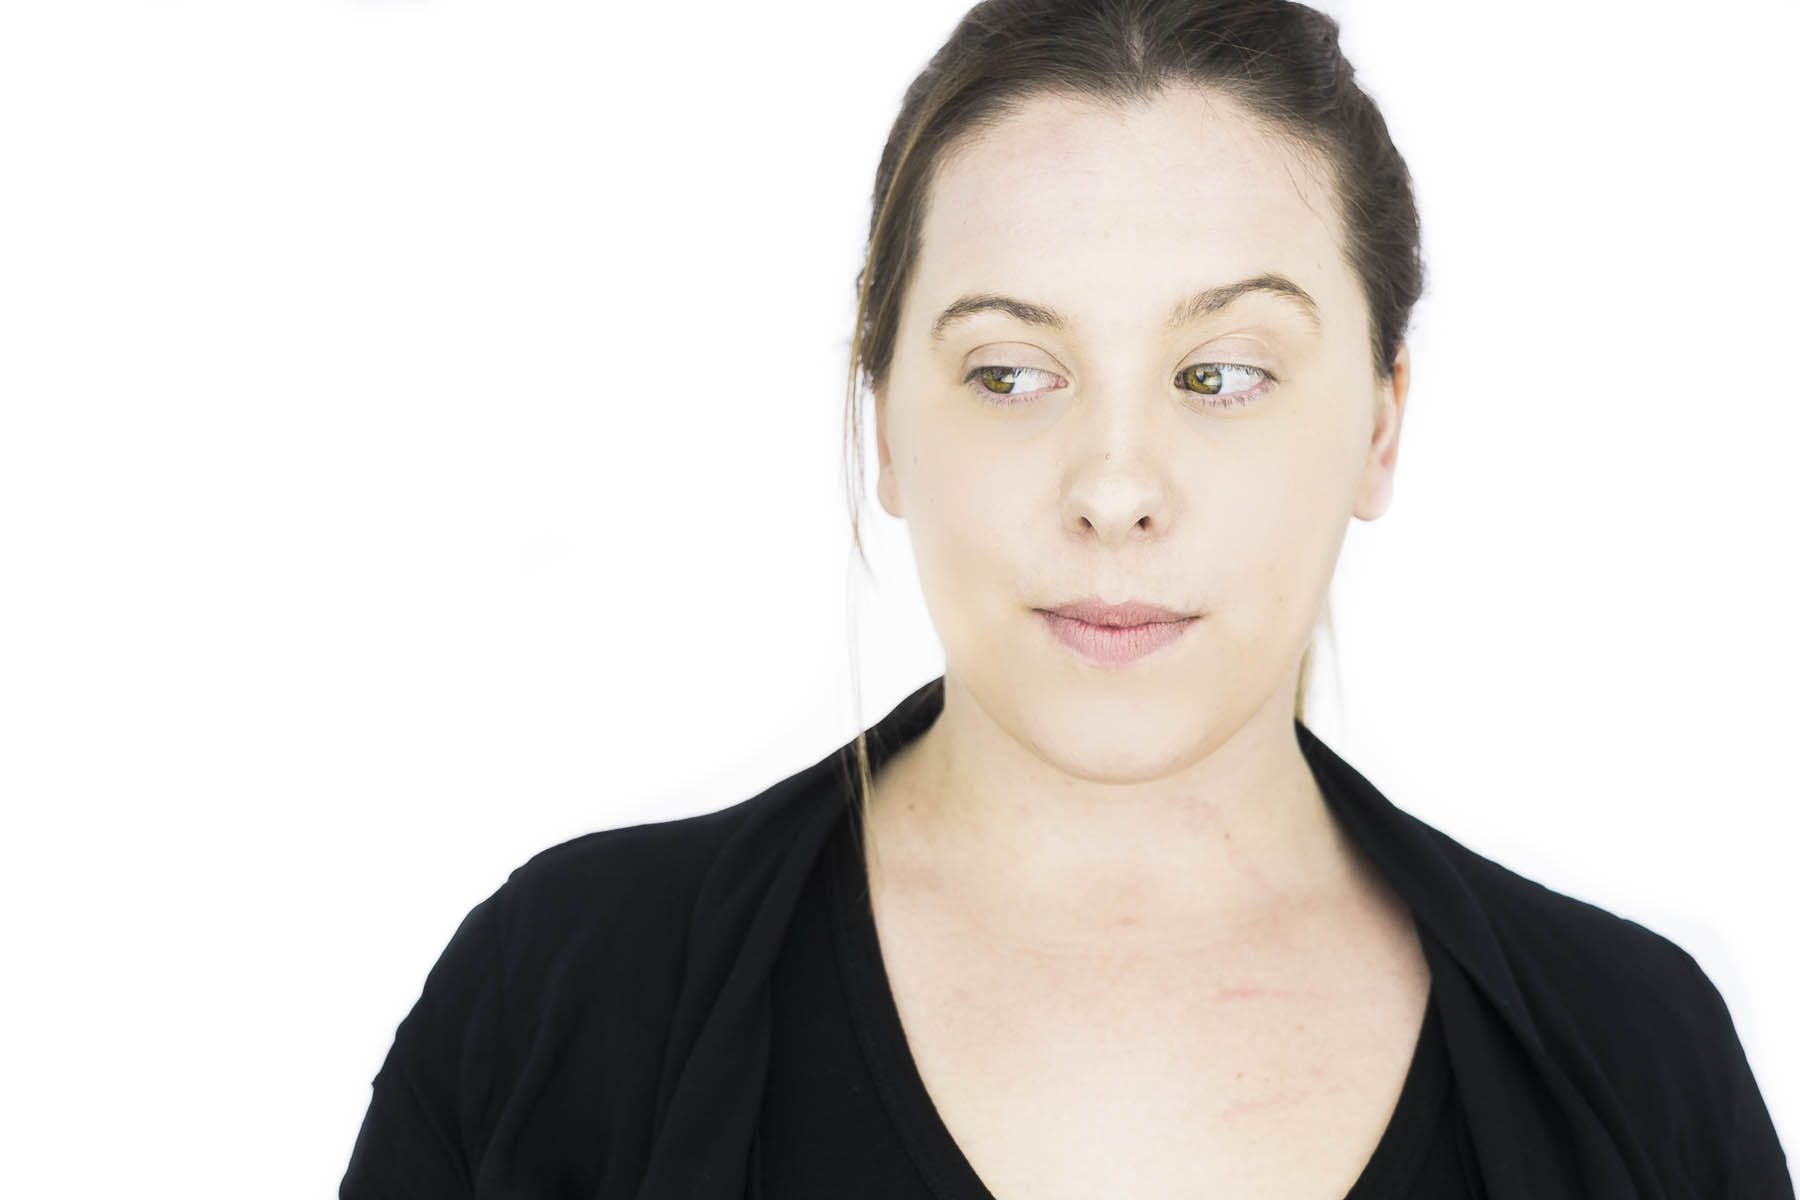 Rachel-a-headshot-session-adelaide-10.jpg